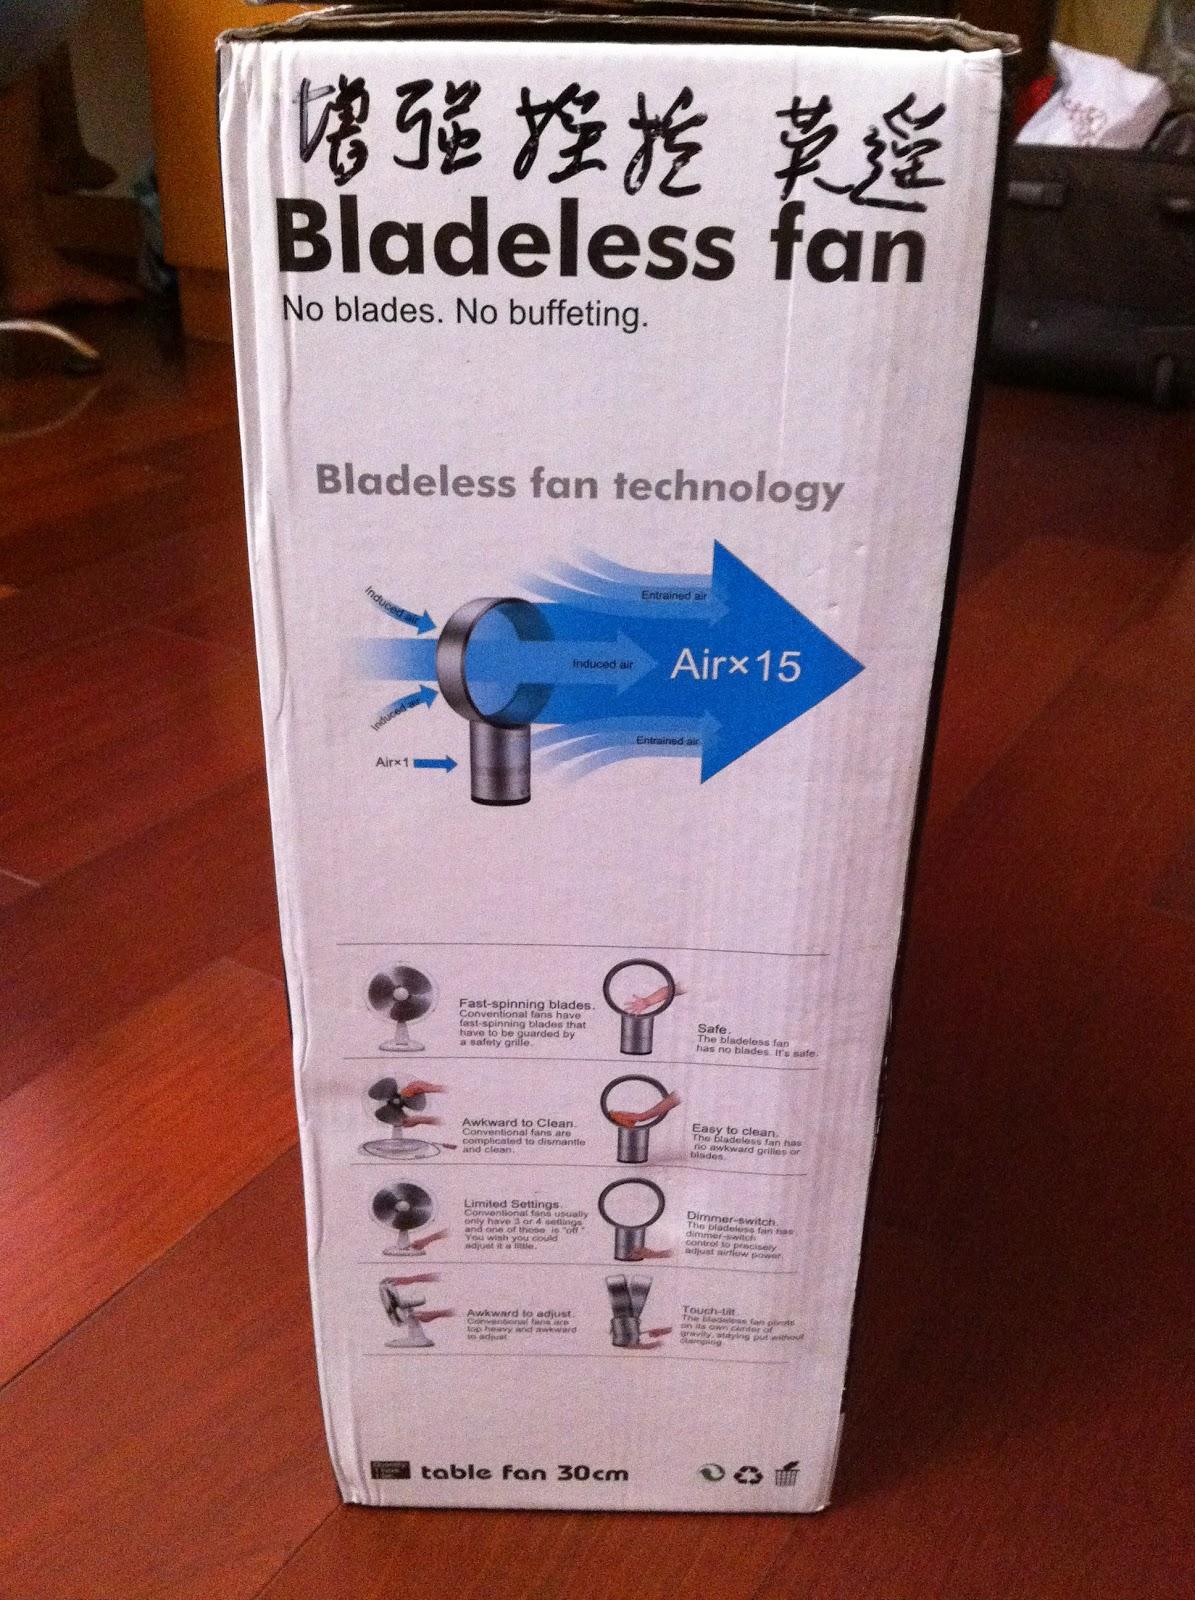 how to clean a macbook fan